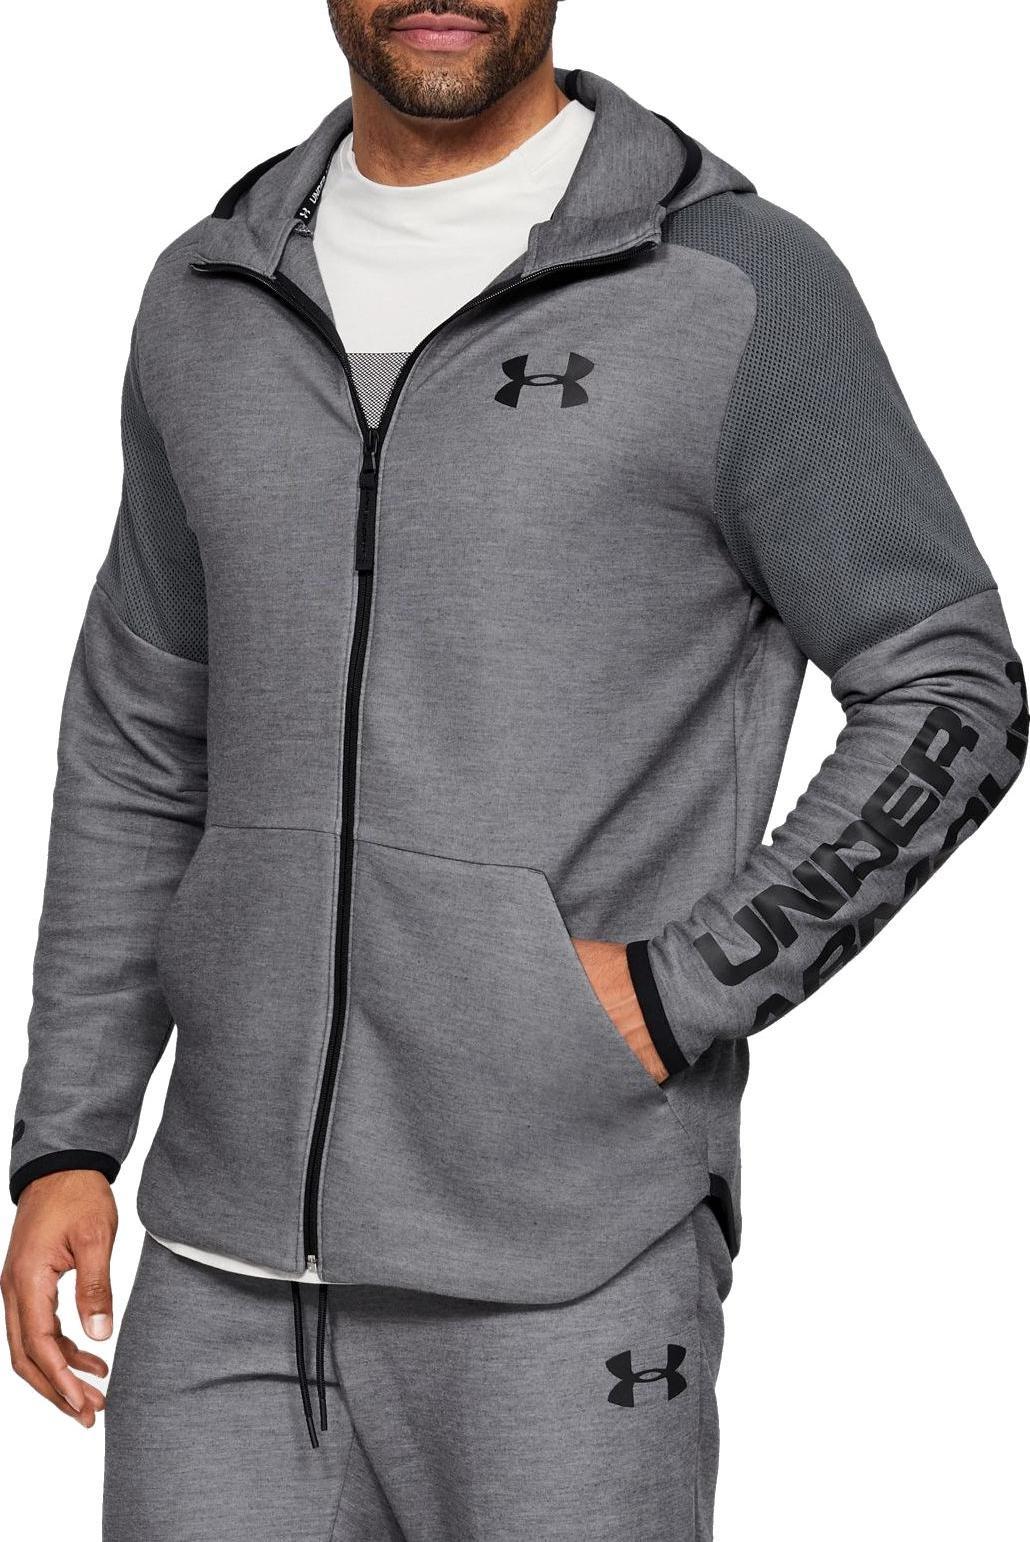 Temprano orgánico taller  Hooded sweatshirt Under Armour MOVE LIGHT GRAPHIC FZ - Top4Running.com